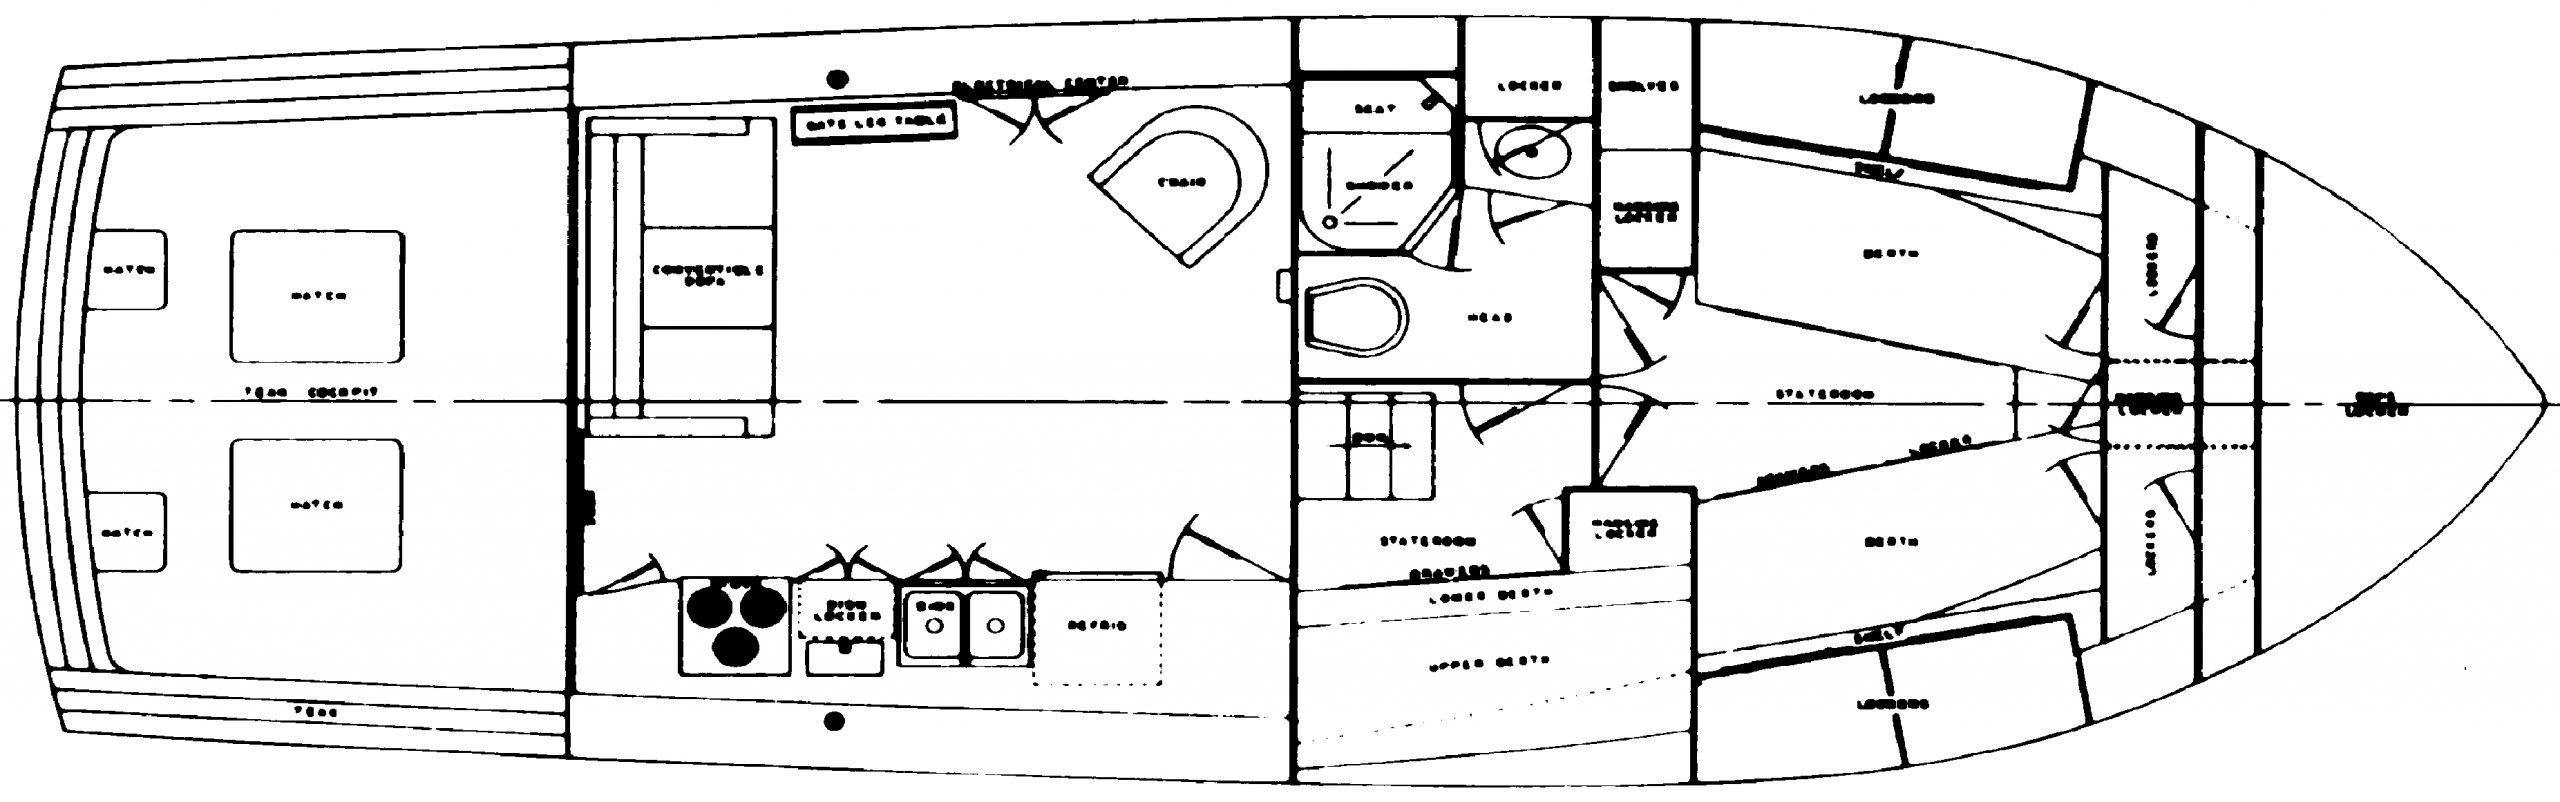 40 Sedan Floor Plan 2